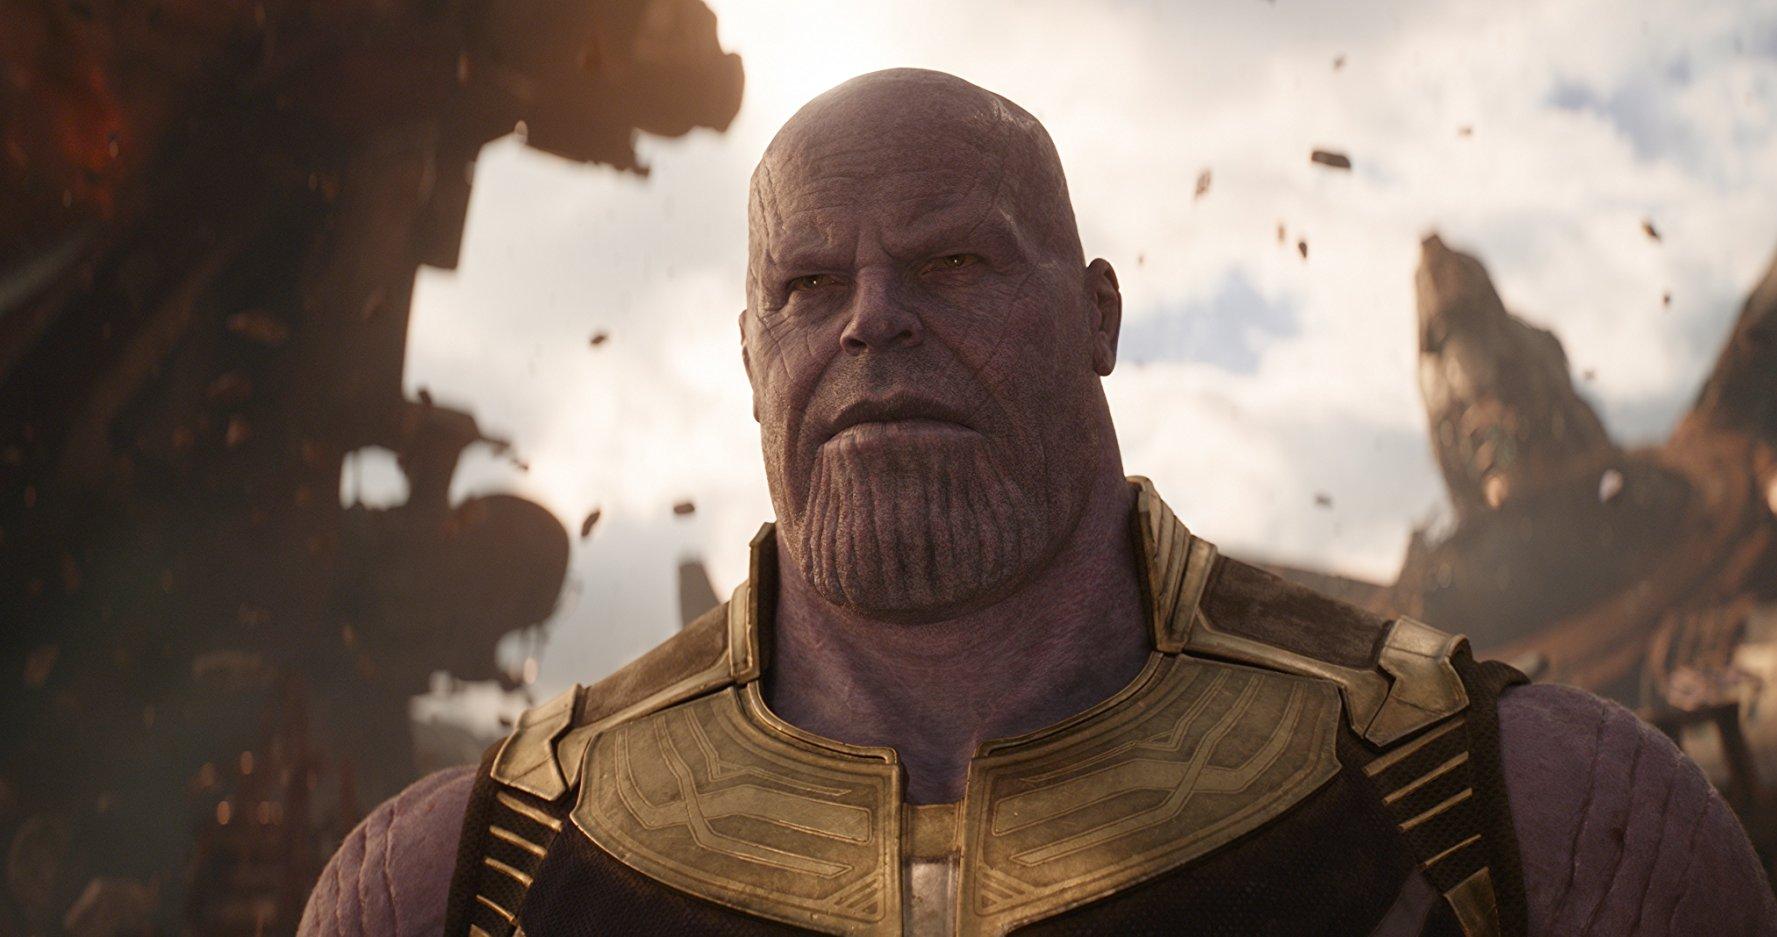 Thanos, el villano de la película Avengers Infinity War